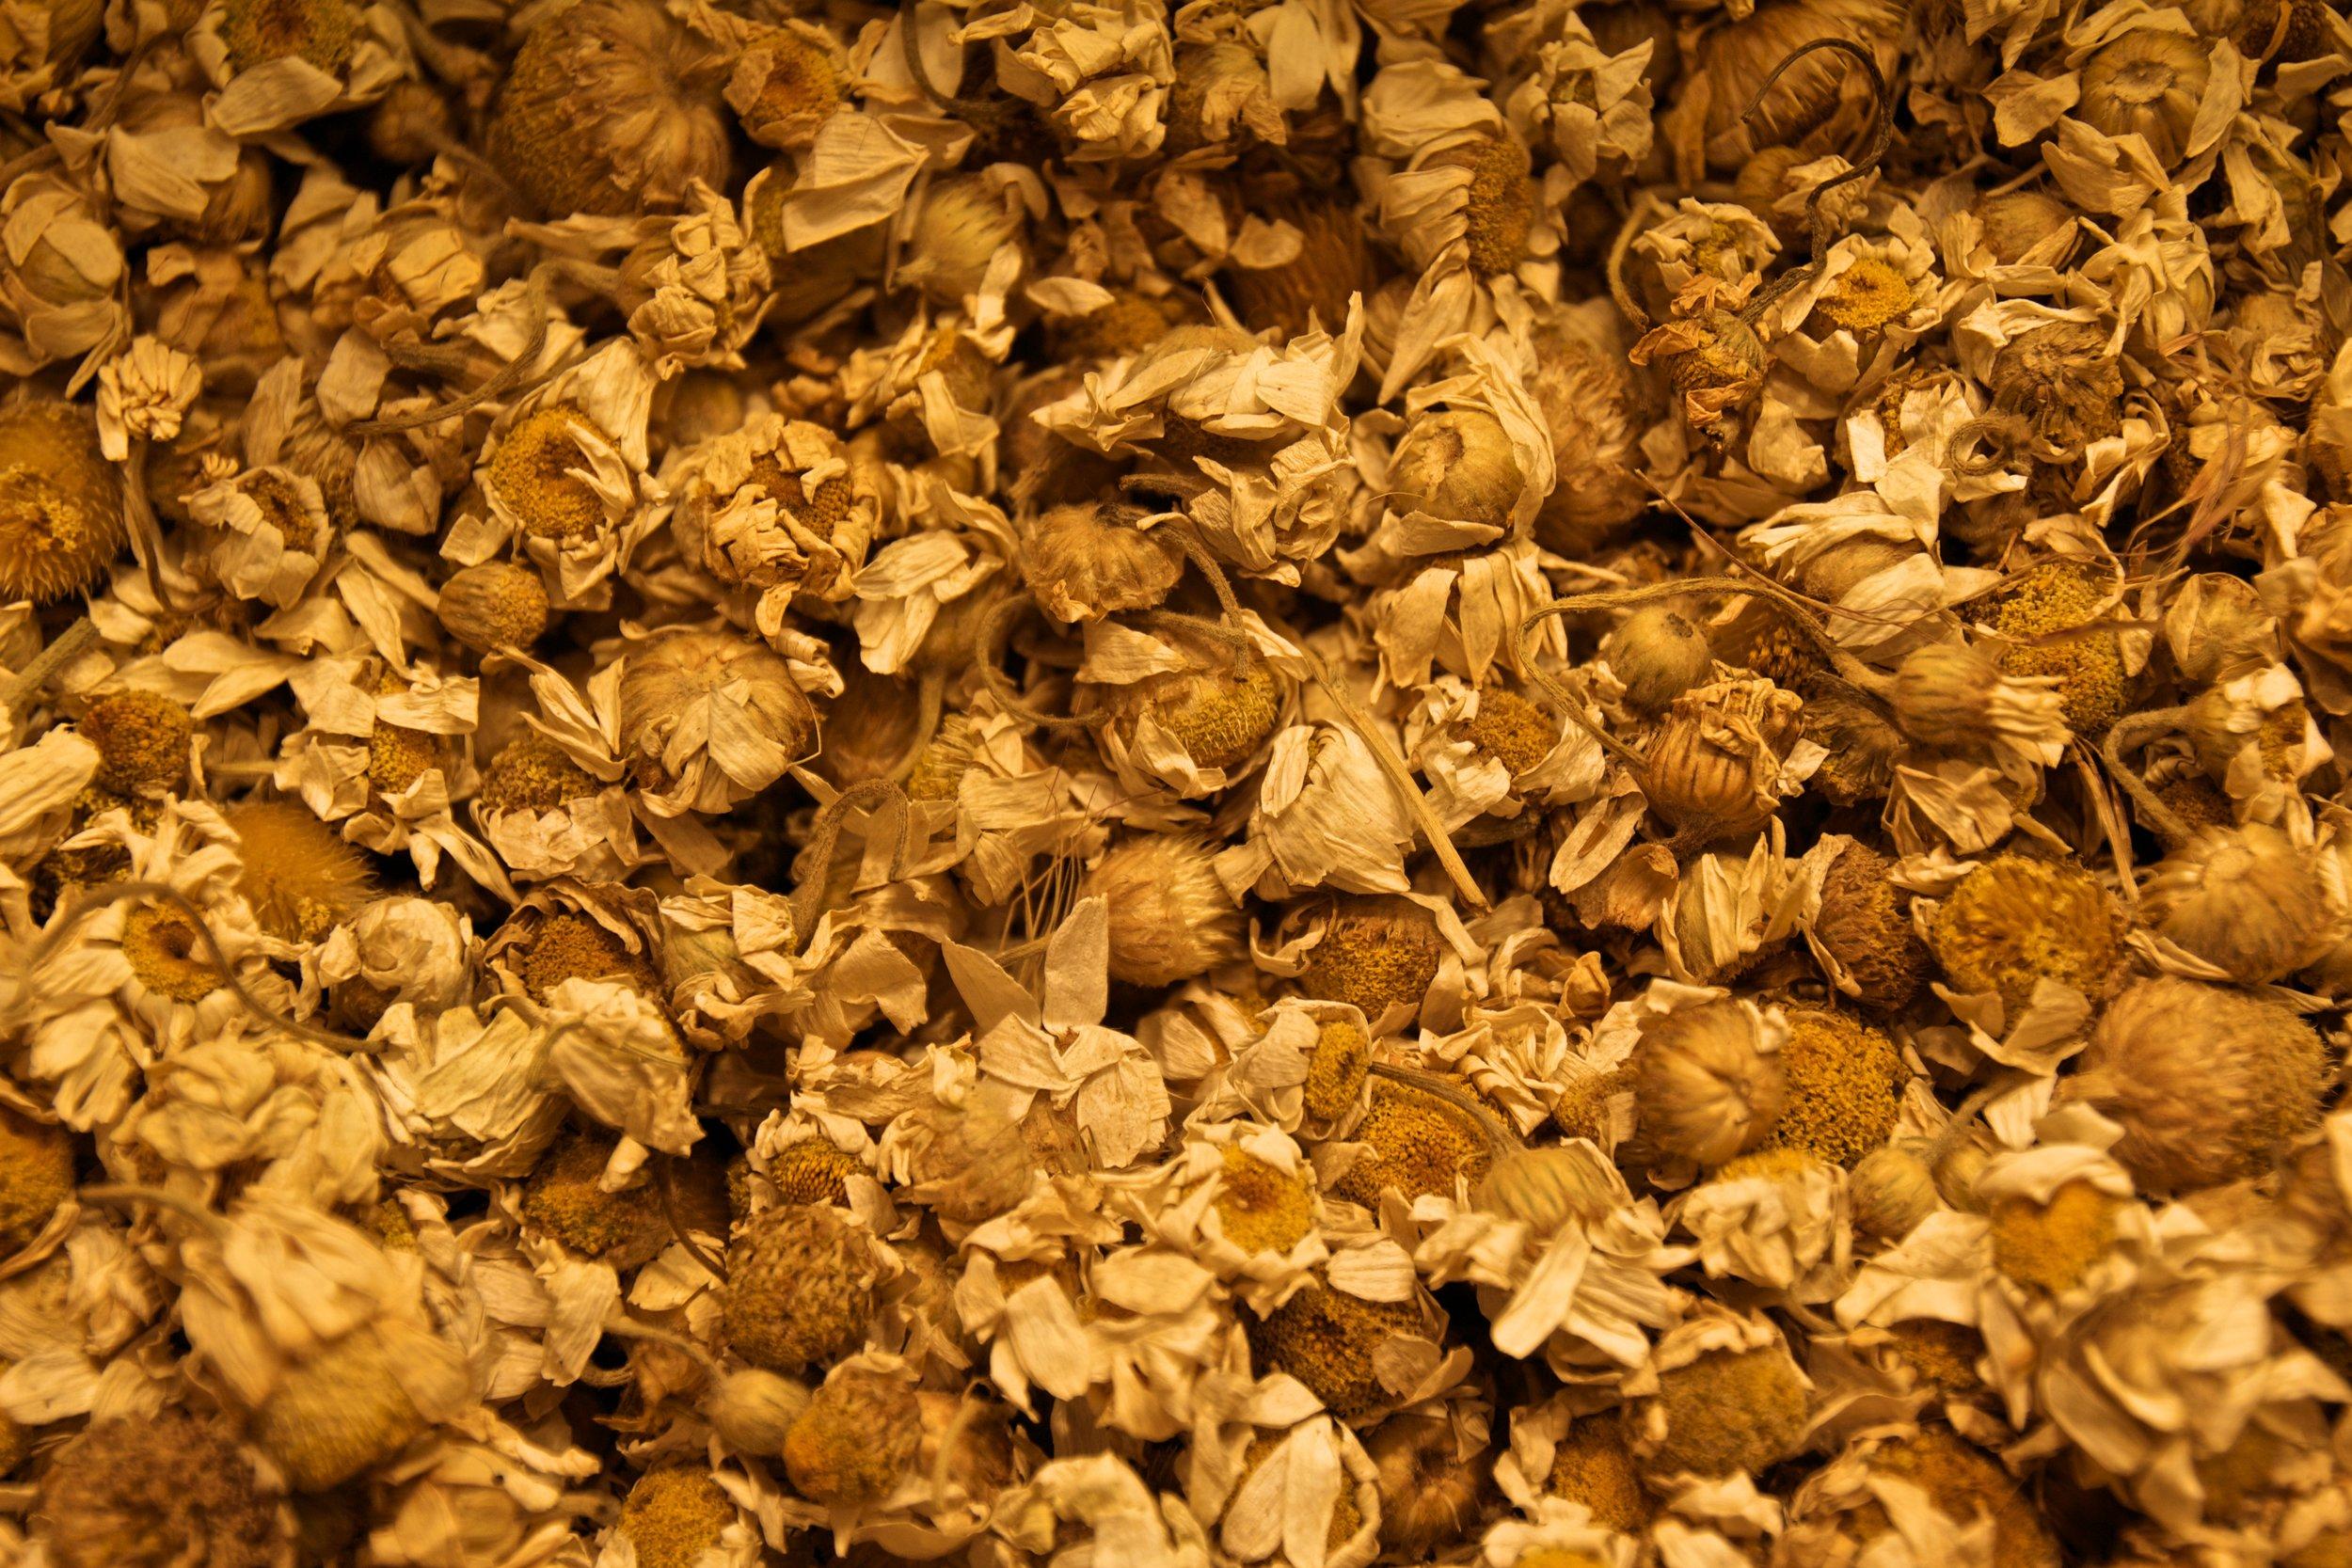 spice bazaar istanbul turkey 15.jpg